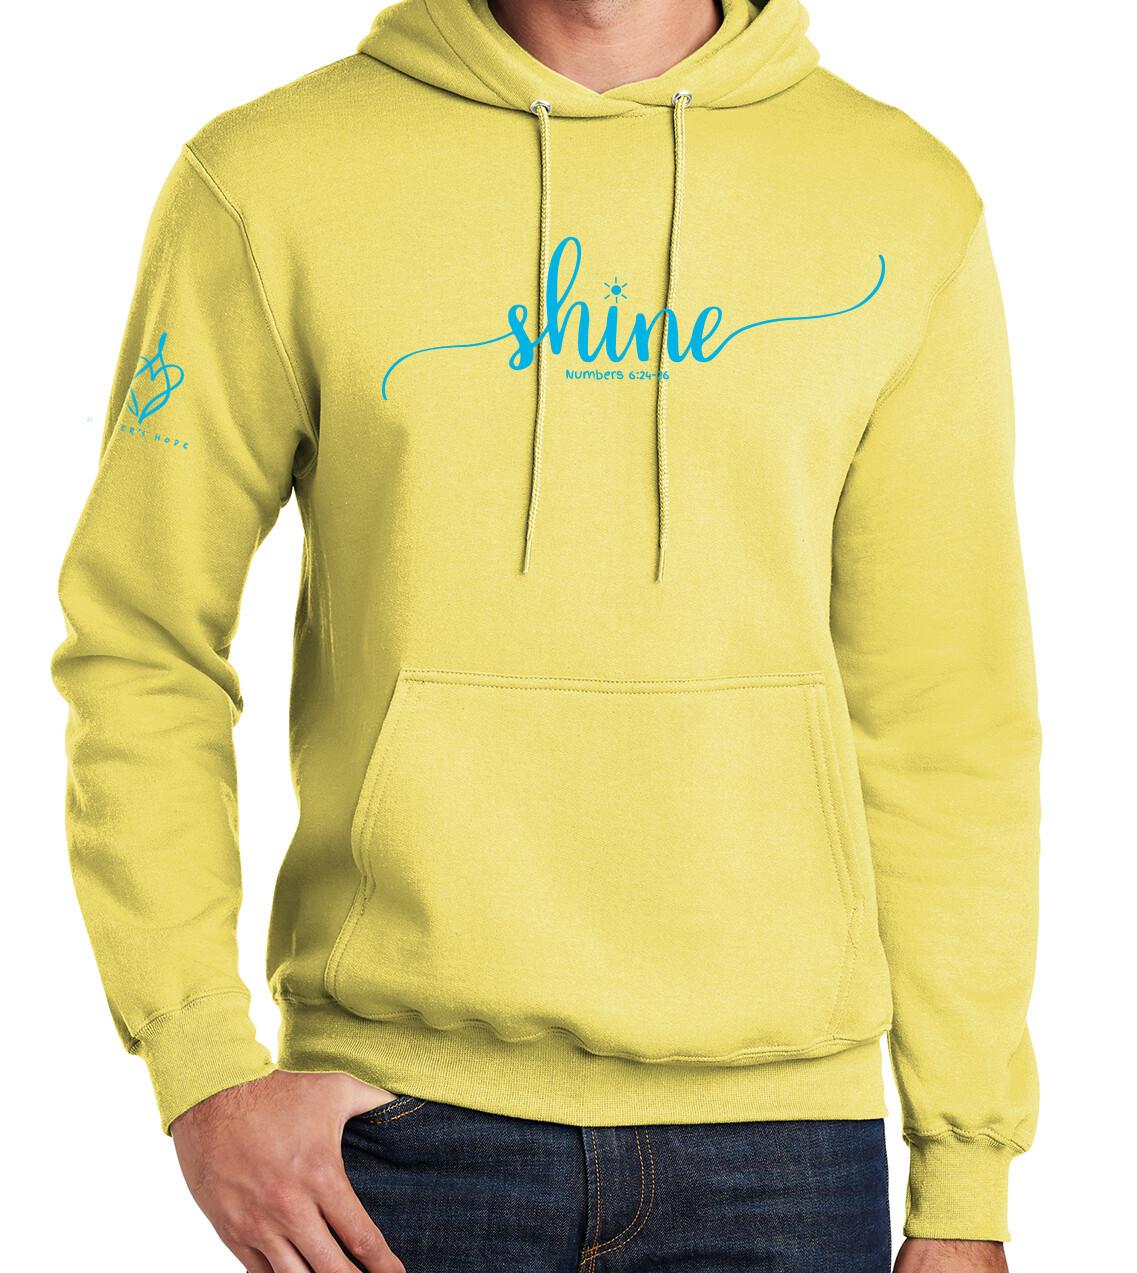 Shine Sweatshirt